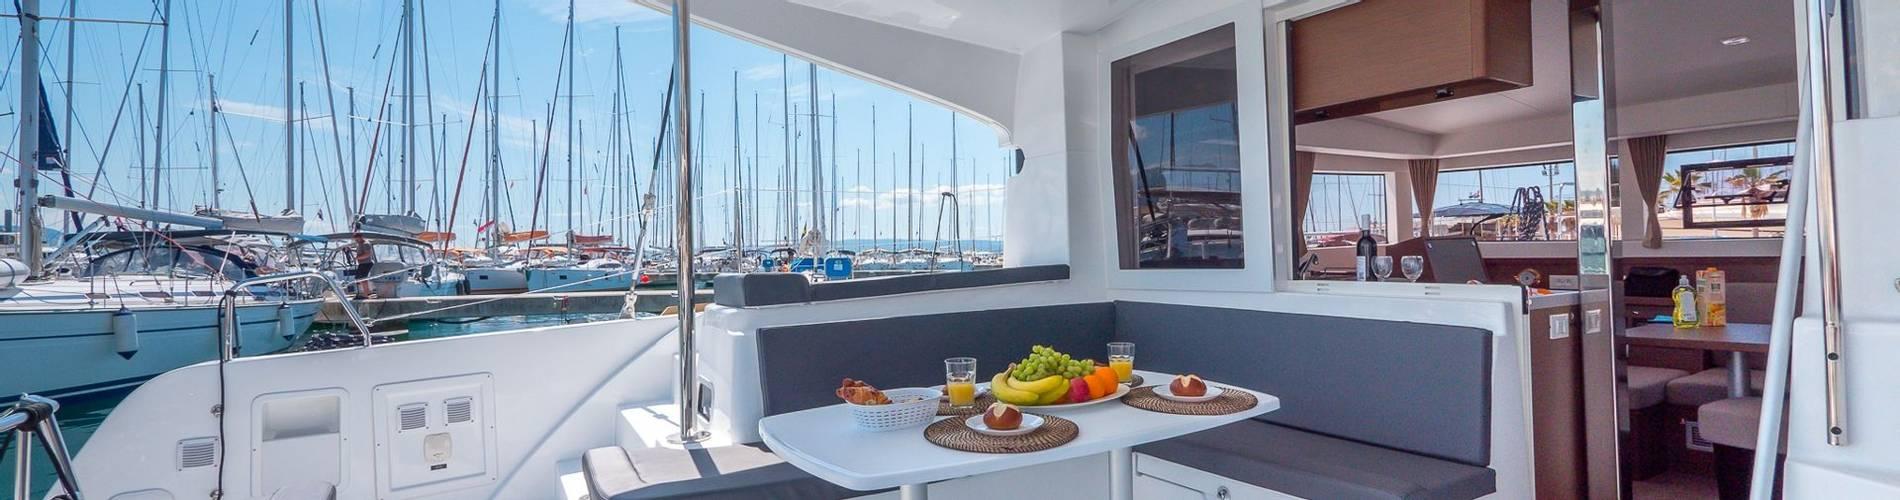 catamaran cruise 4.jpg